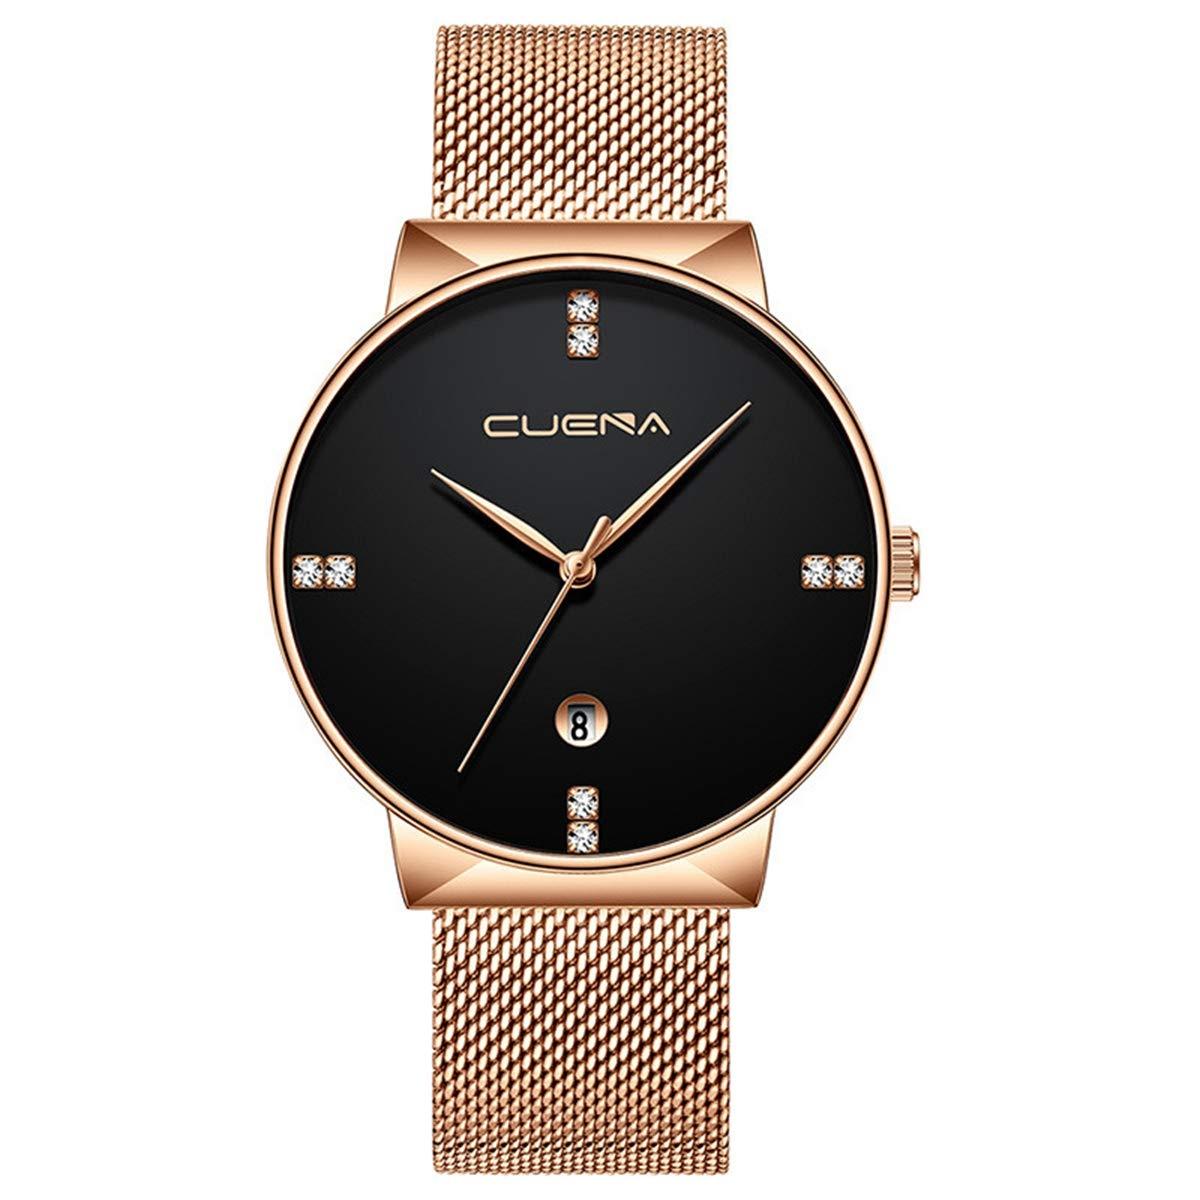 ZODRQ Men's Watch,Fashion Life Waterproof Sport Watches Stainless Steel Mesh Wrist Watch Wristwatch Date Quartz Watch Gift (D) by ZODRQ